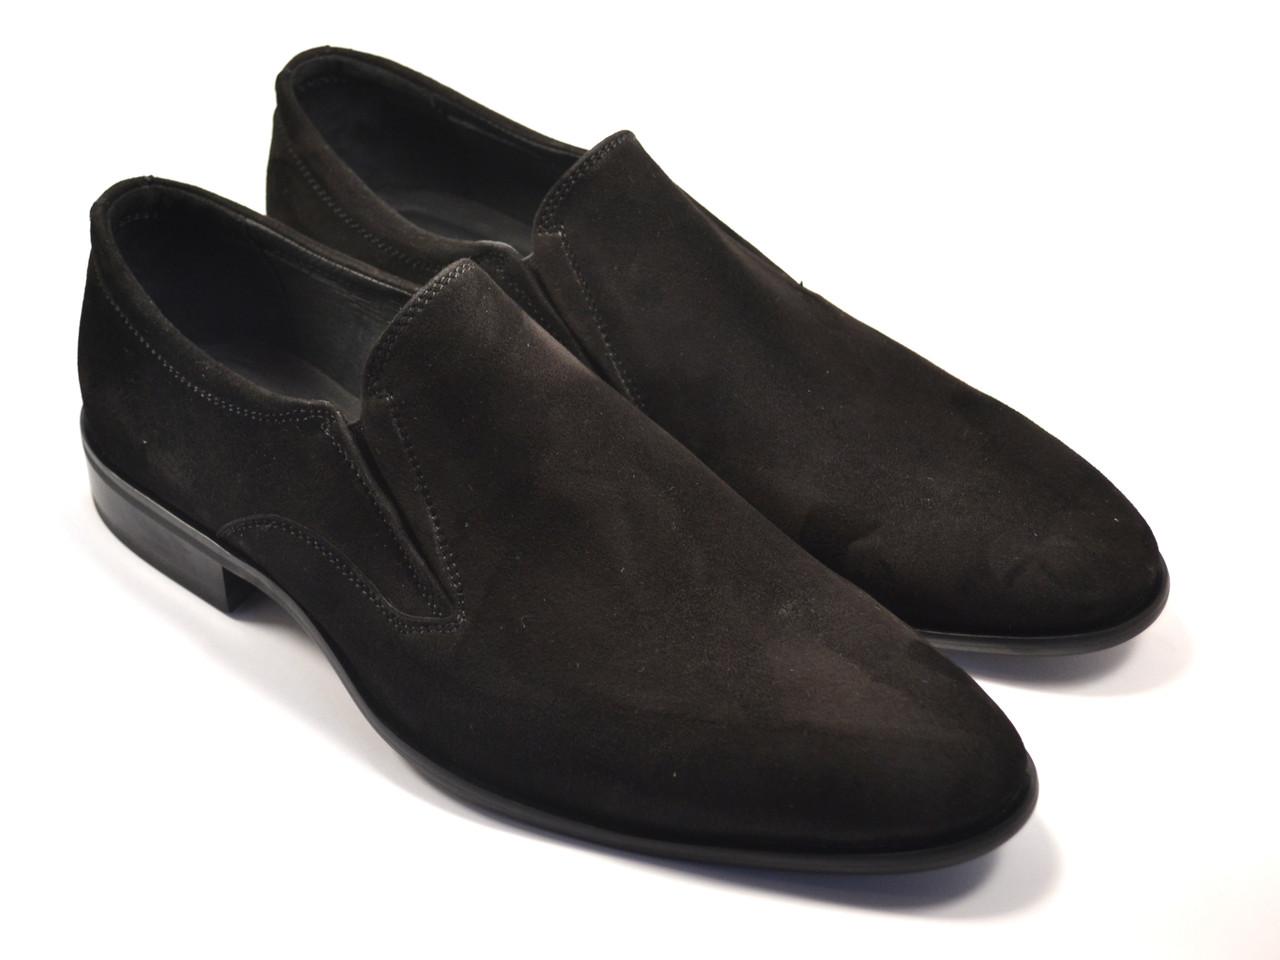 Туфли мужские на каблуке черные замшевые без шнурков на каблуке Rosso Avangard Mono Vel Black